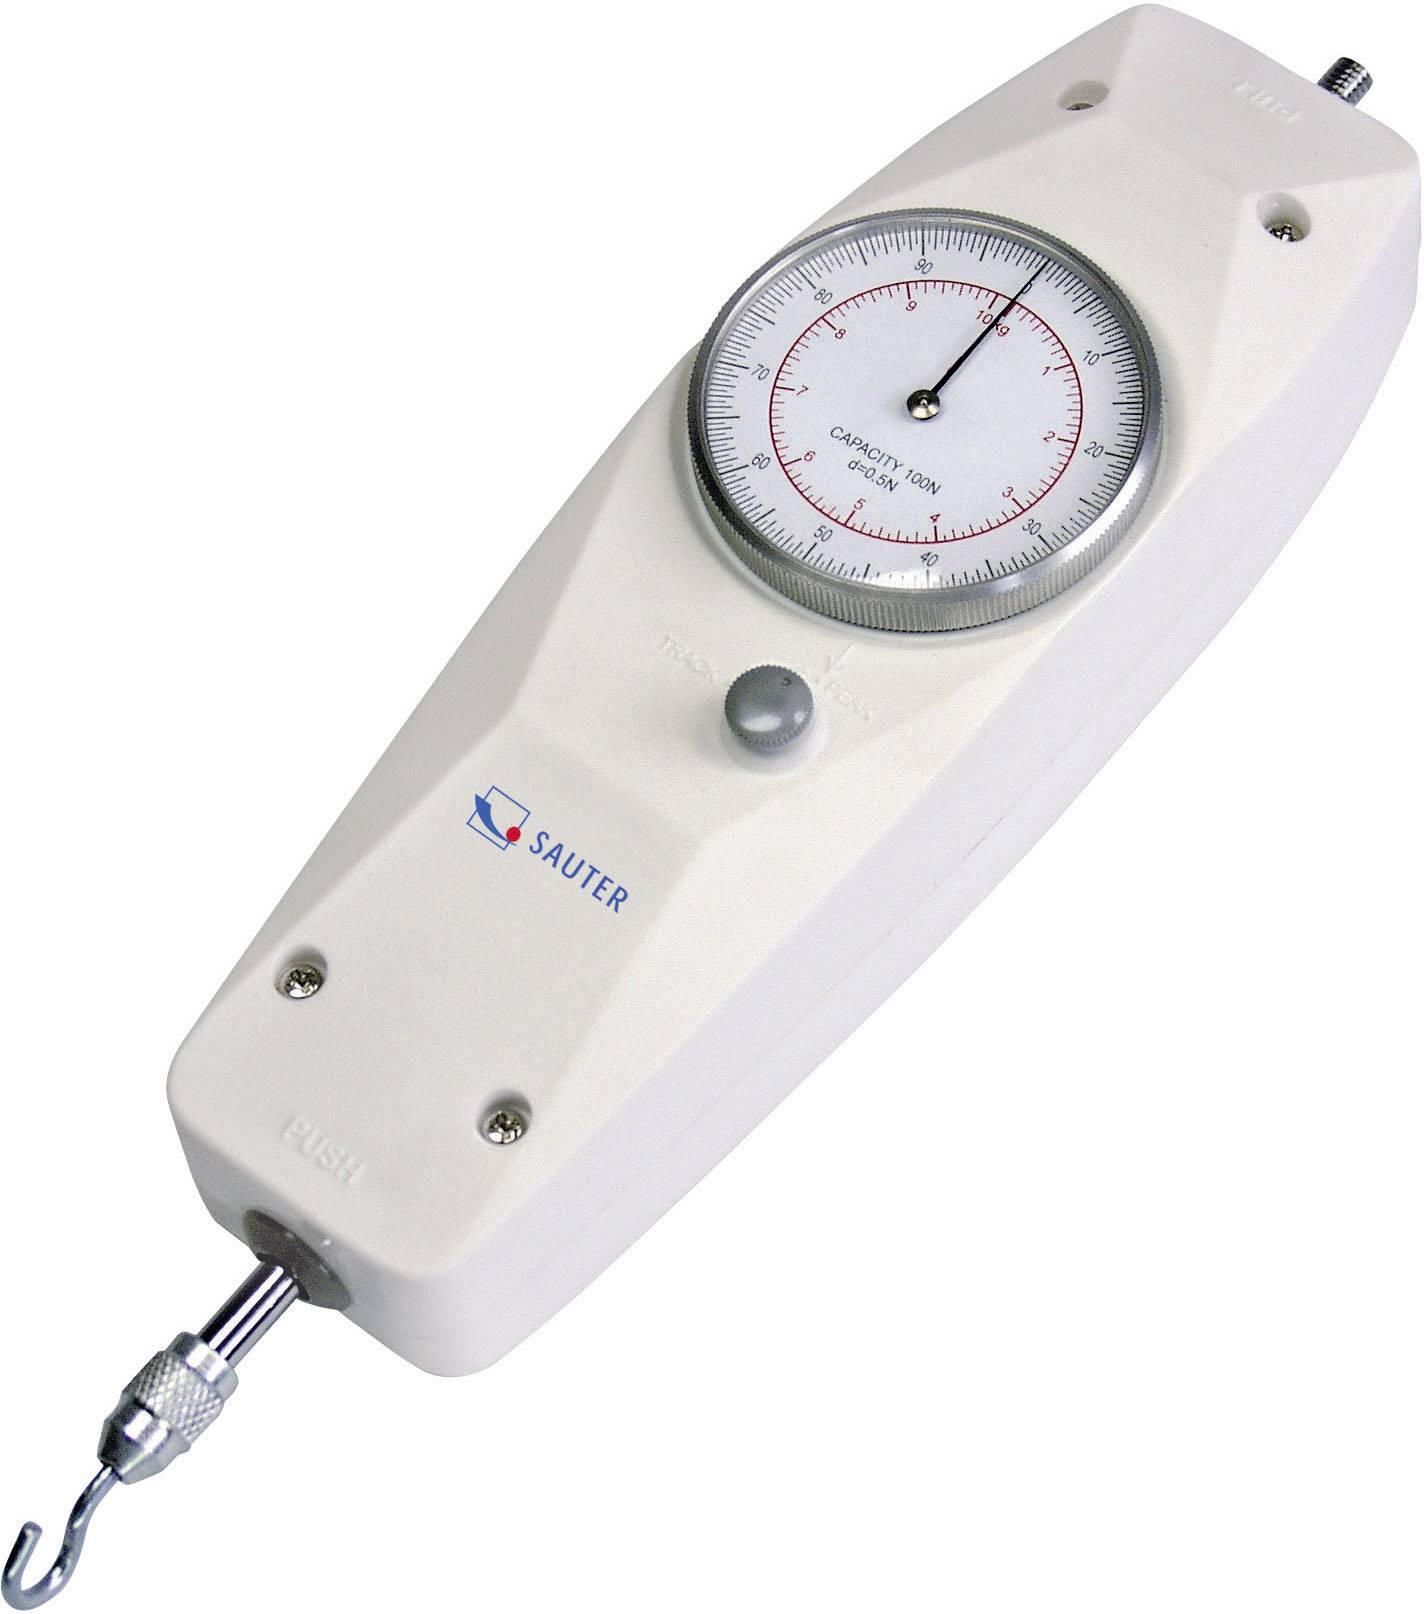 Sauter FA 500. Kraftmessgerät, Newton-Meter 500 N Kalibrováno dle ISO